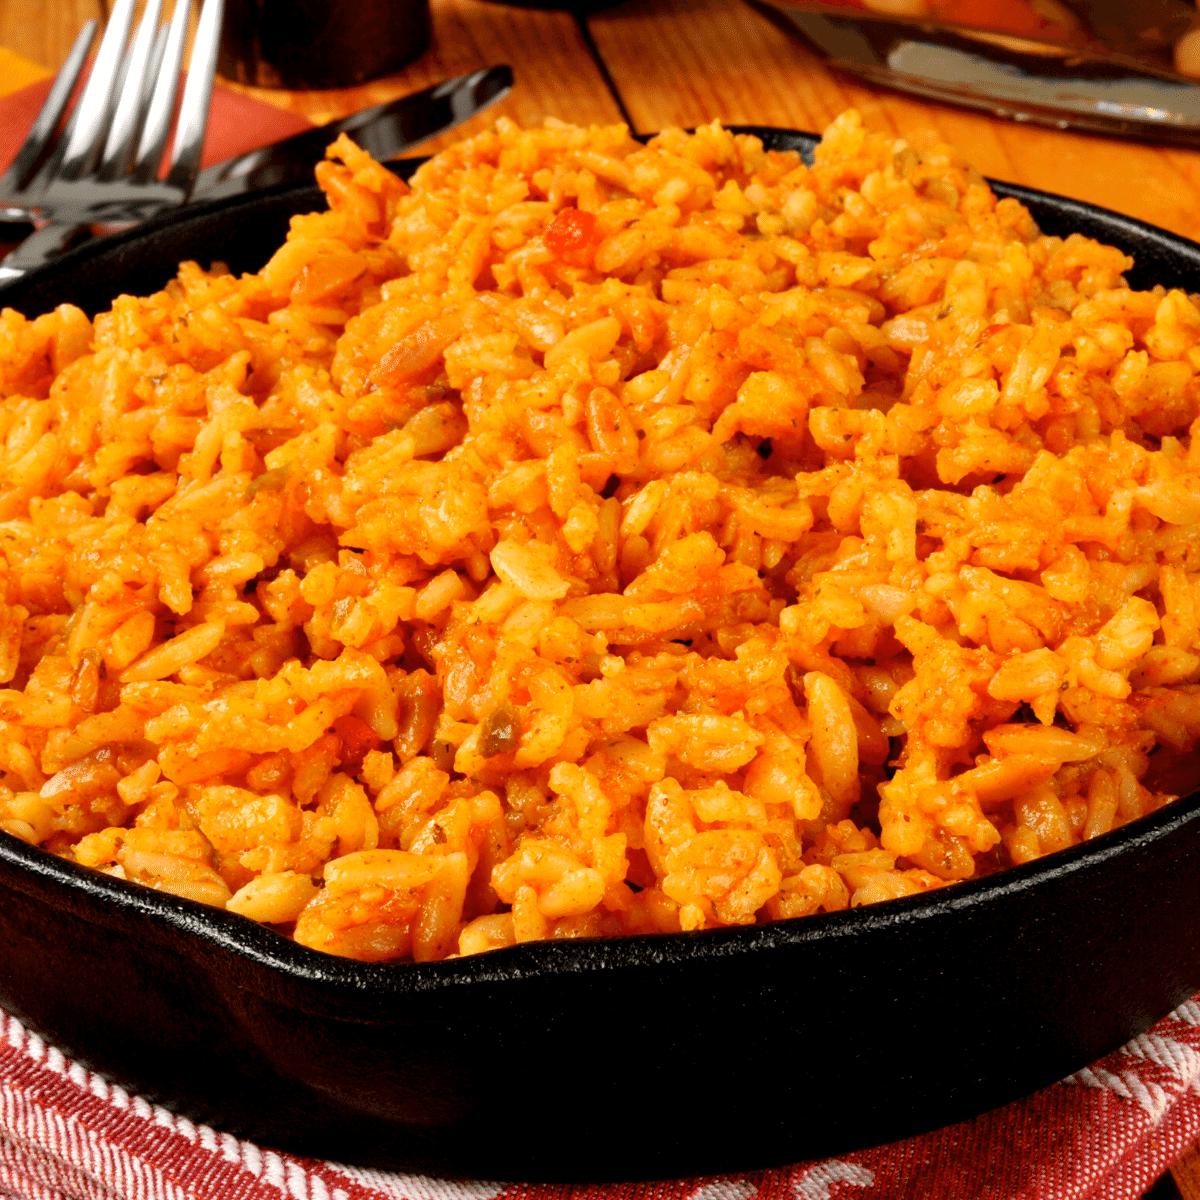 Low Carb Spanish Cauliflower rice FI